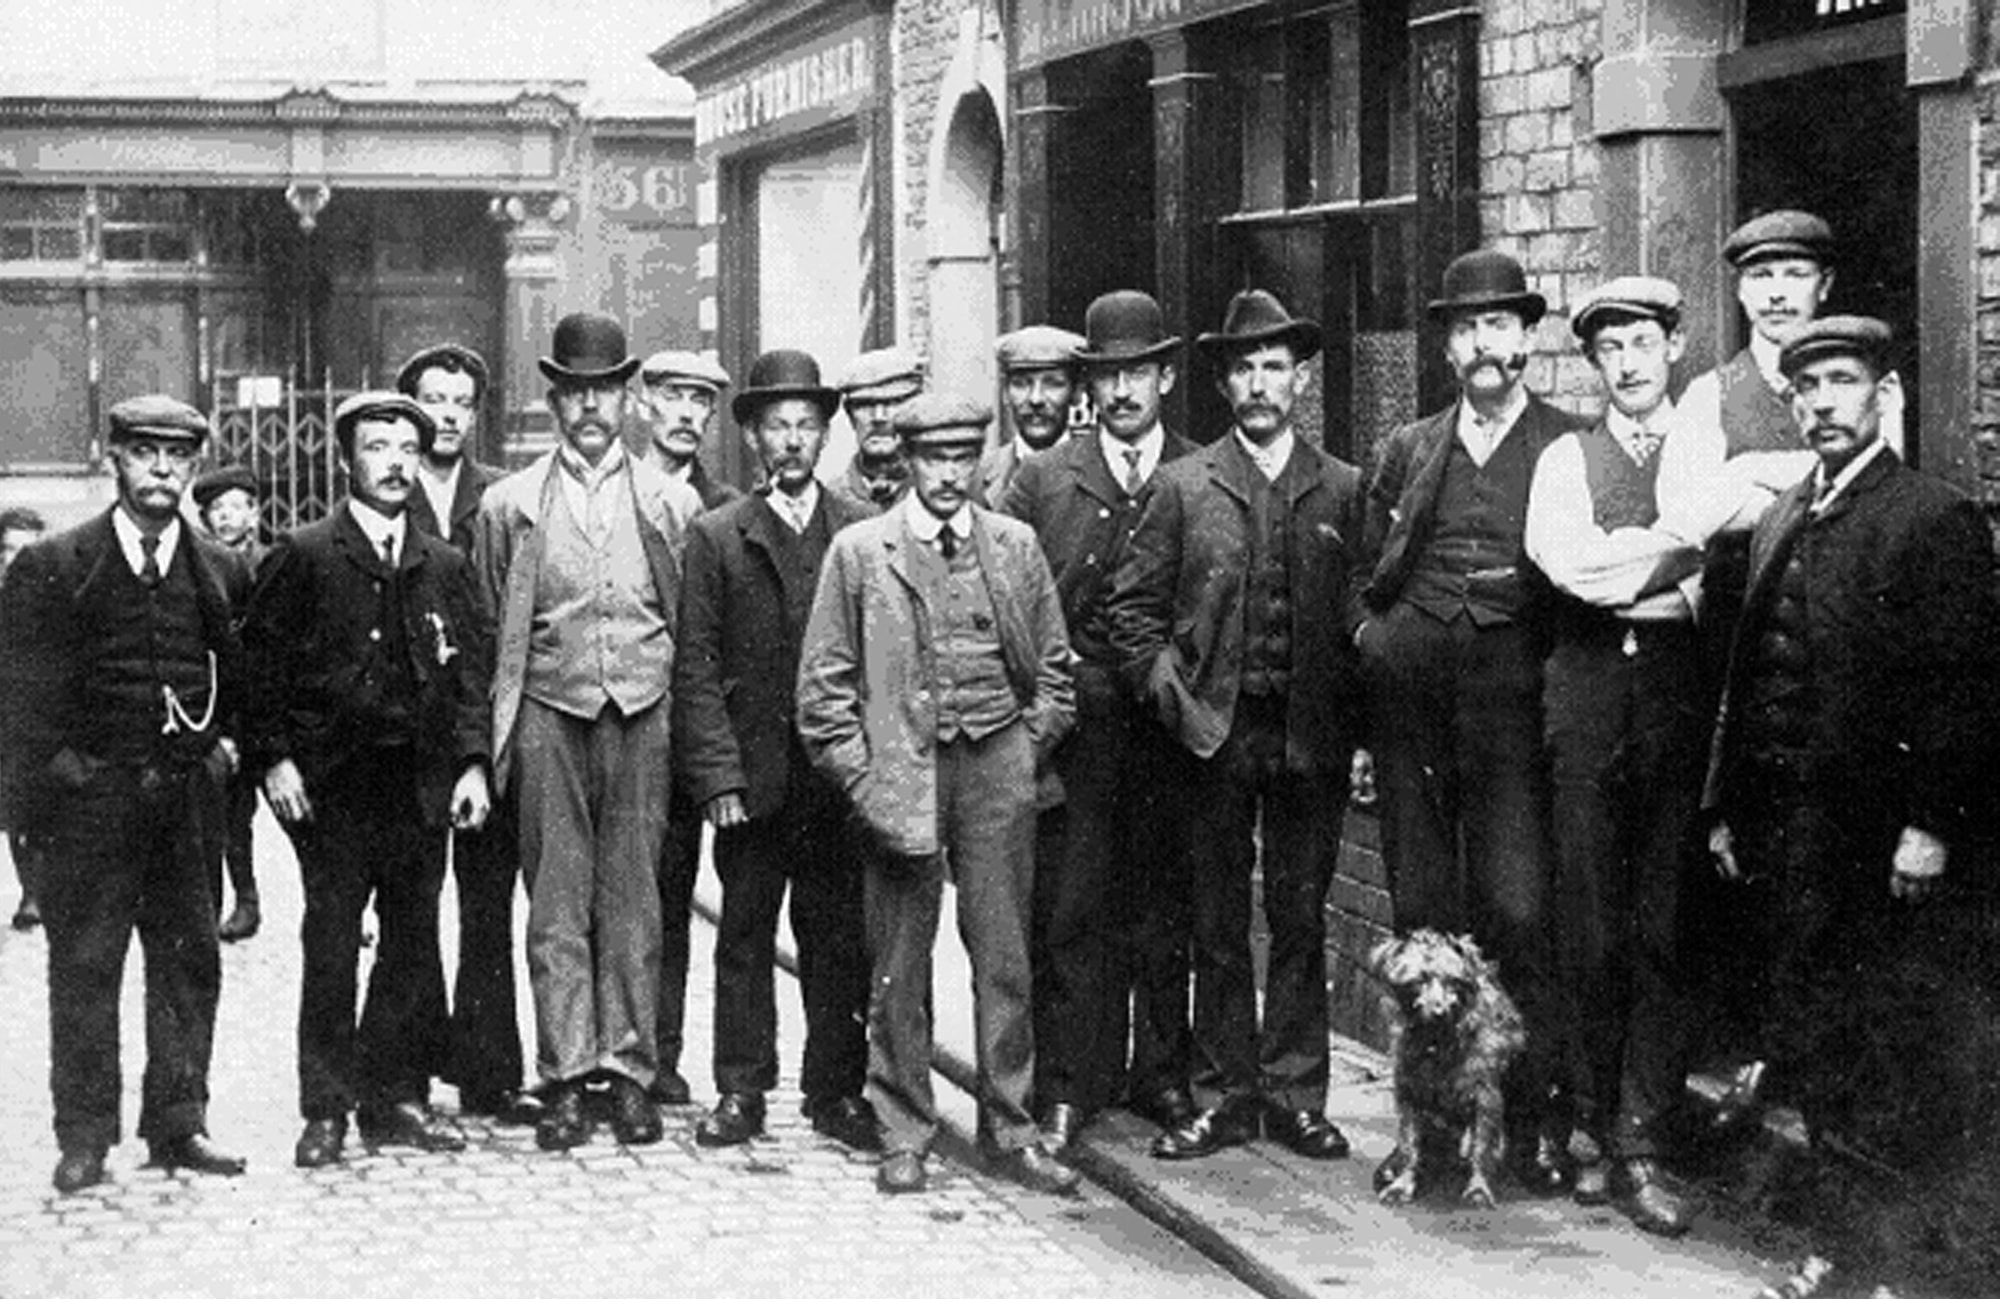 Men posing on Fisher Street